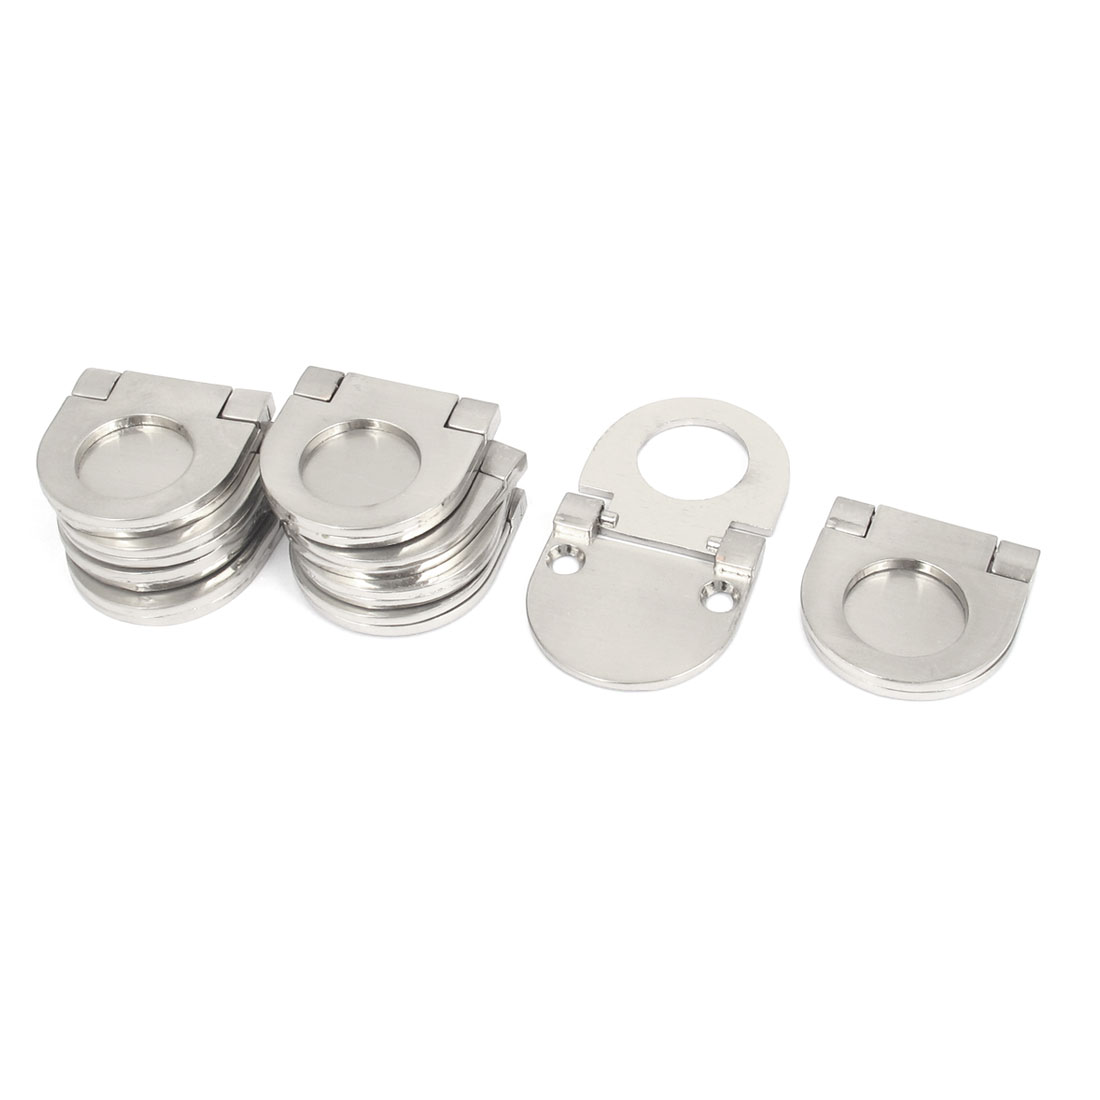 Cupboard Drawer Metal Flush Mount Pull Ring Handle Knob Silver Tone 10pcs